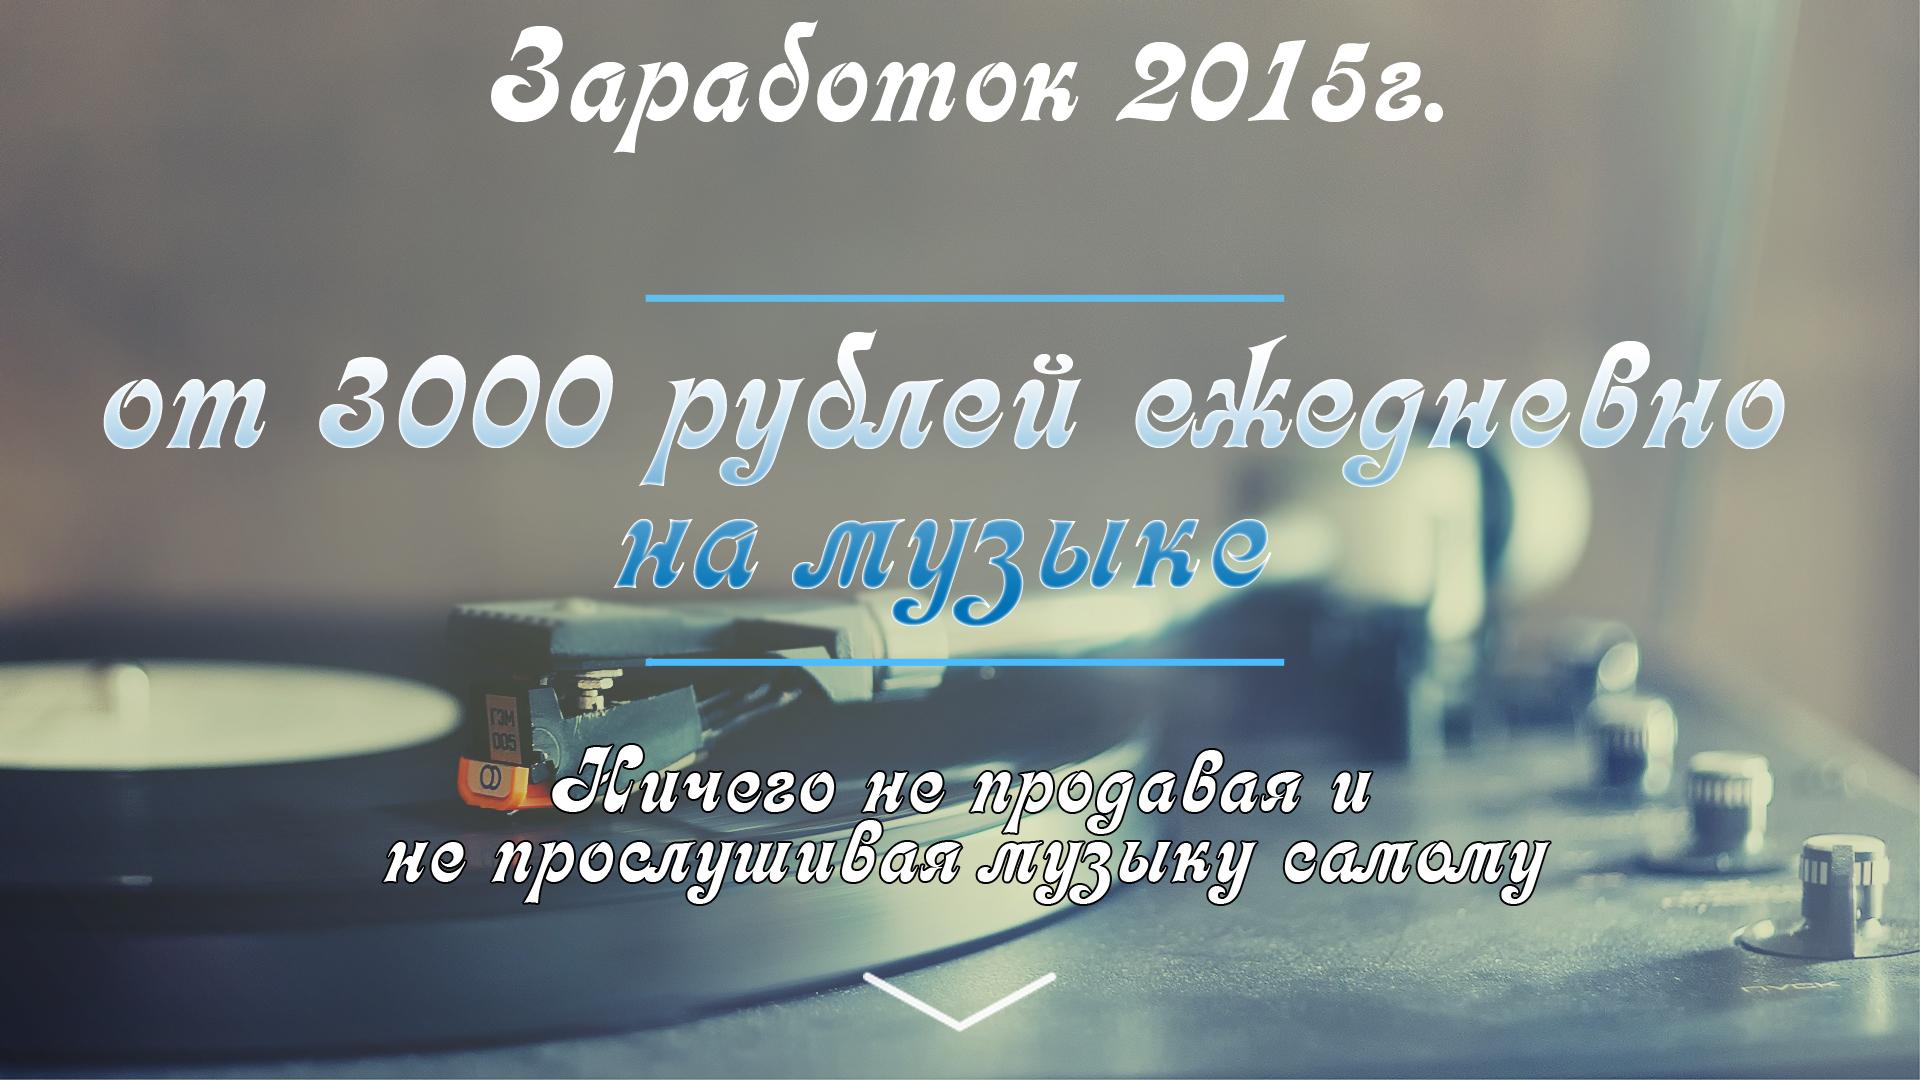 http://rabotaot100.ru.justclick.ru/media/content/rabotaot100.ru/%D0%B7%D0%B0%D0%B3%D0%BE%D0%BB%D0%BE%D0%B2%D0%BE%D0%BA(5).jpg